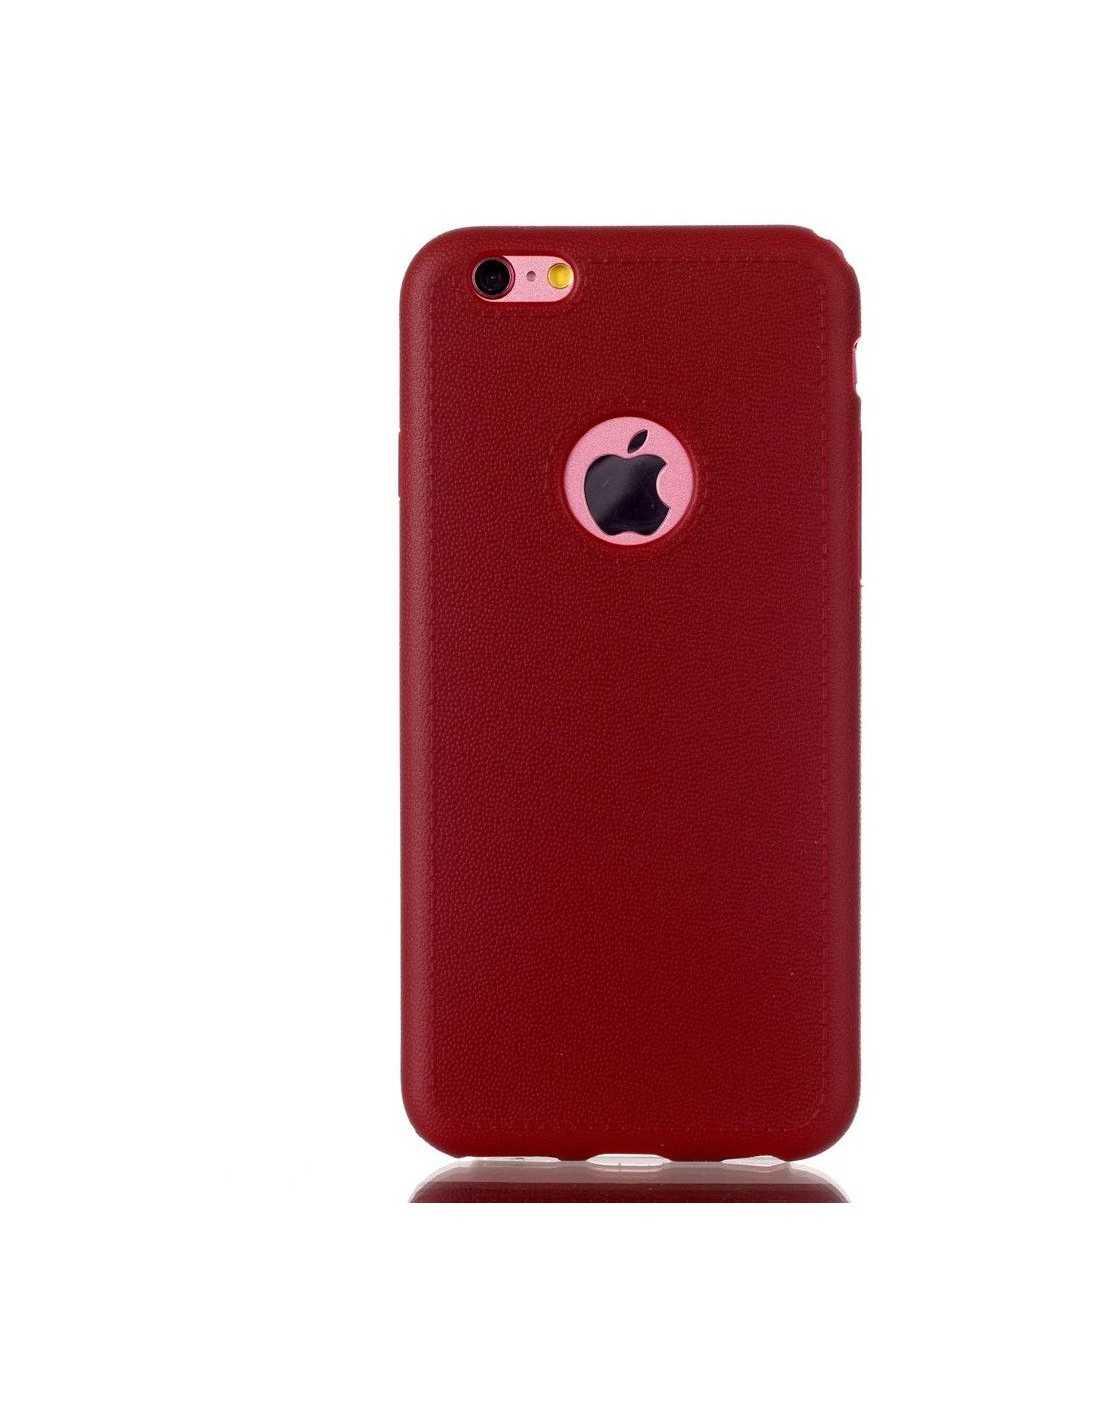 coque iphone 6s et iphone 6 souple seconde peau rouge